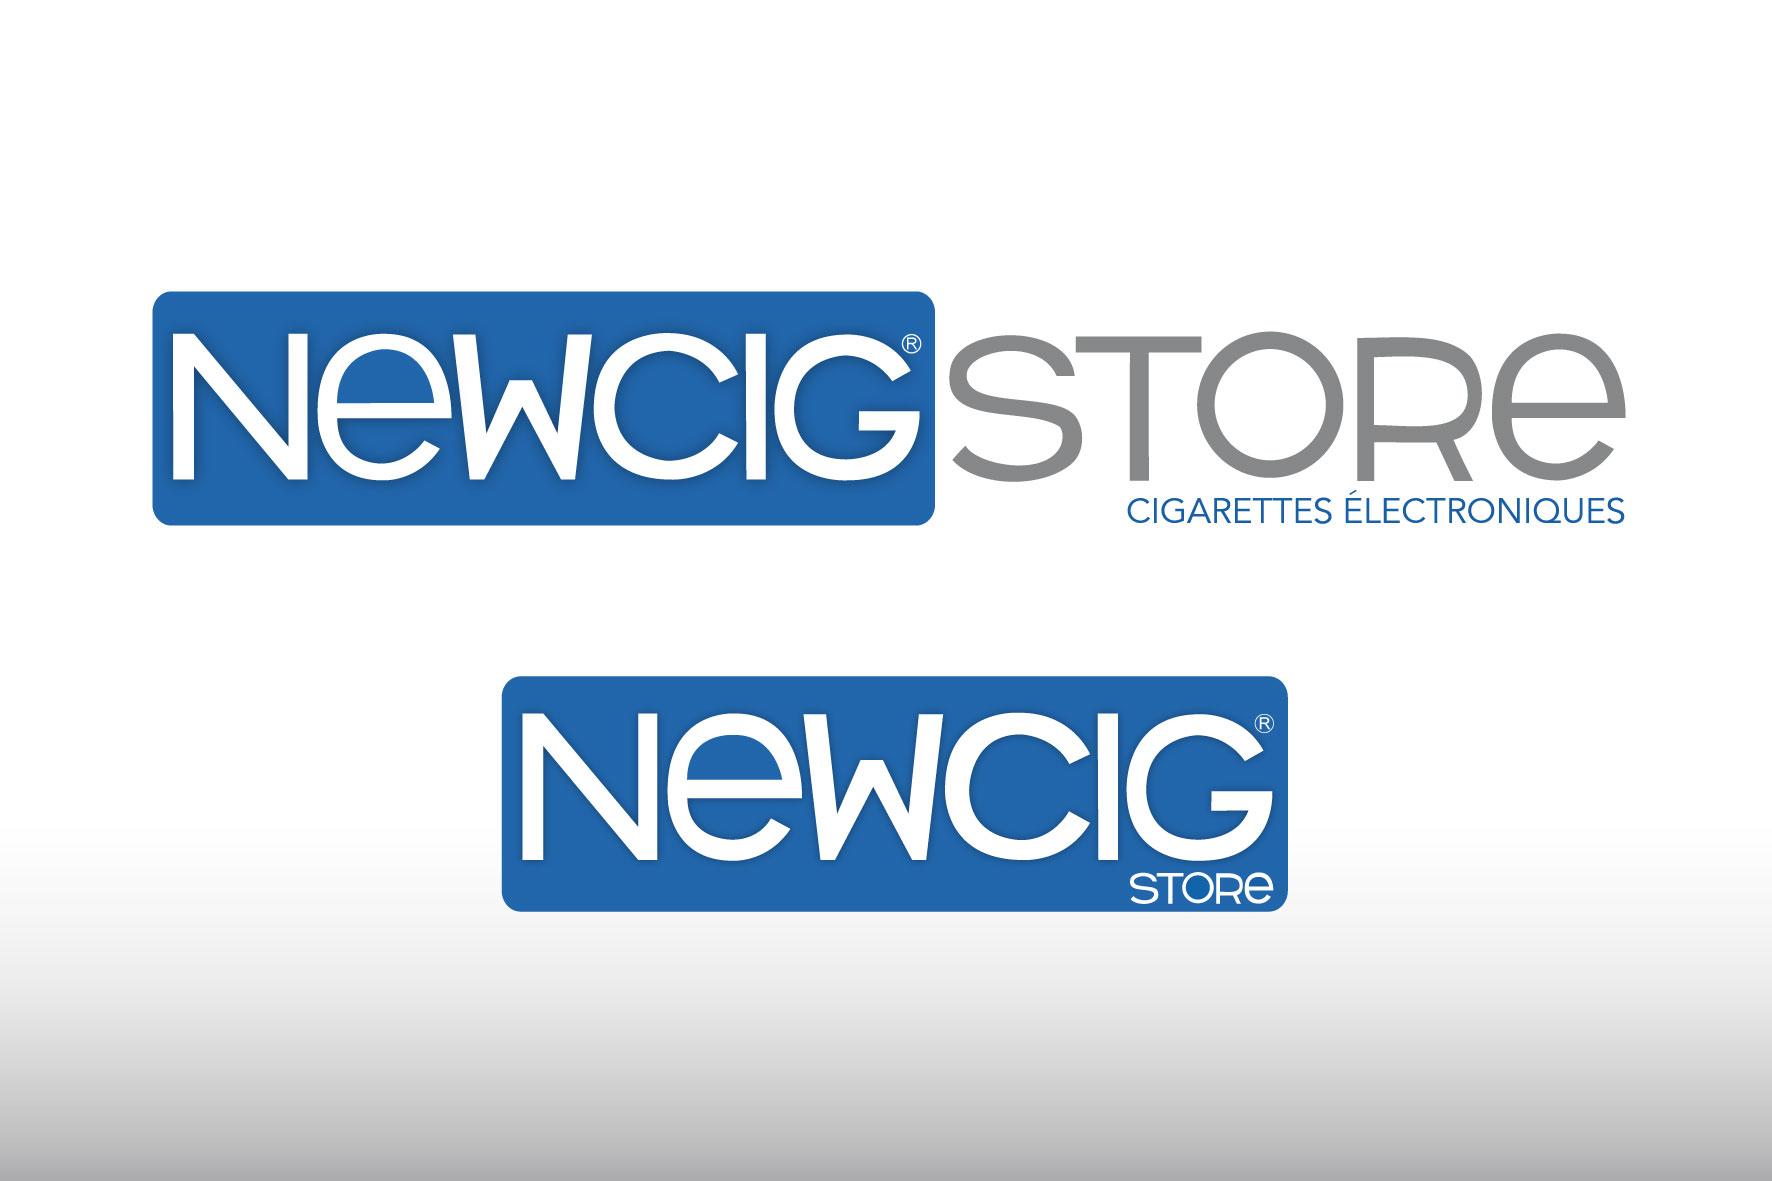 Newcig Store